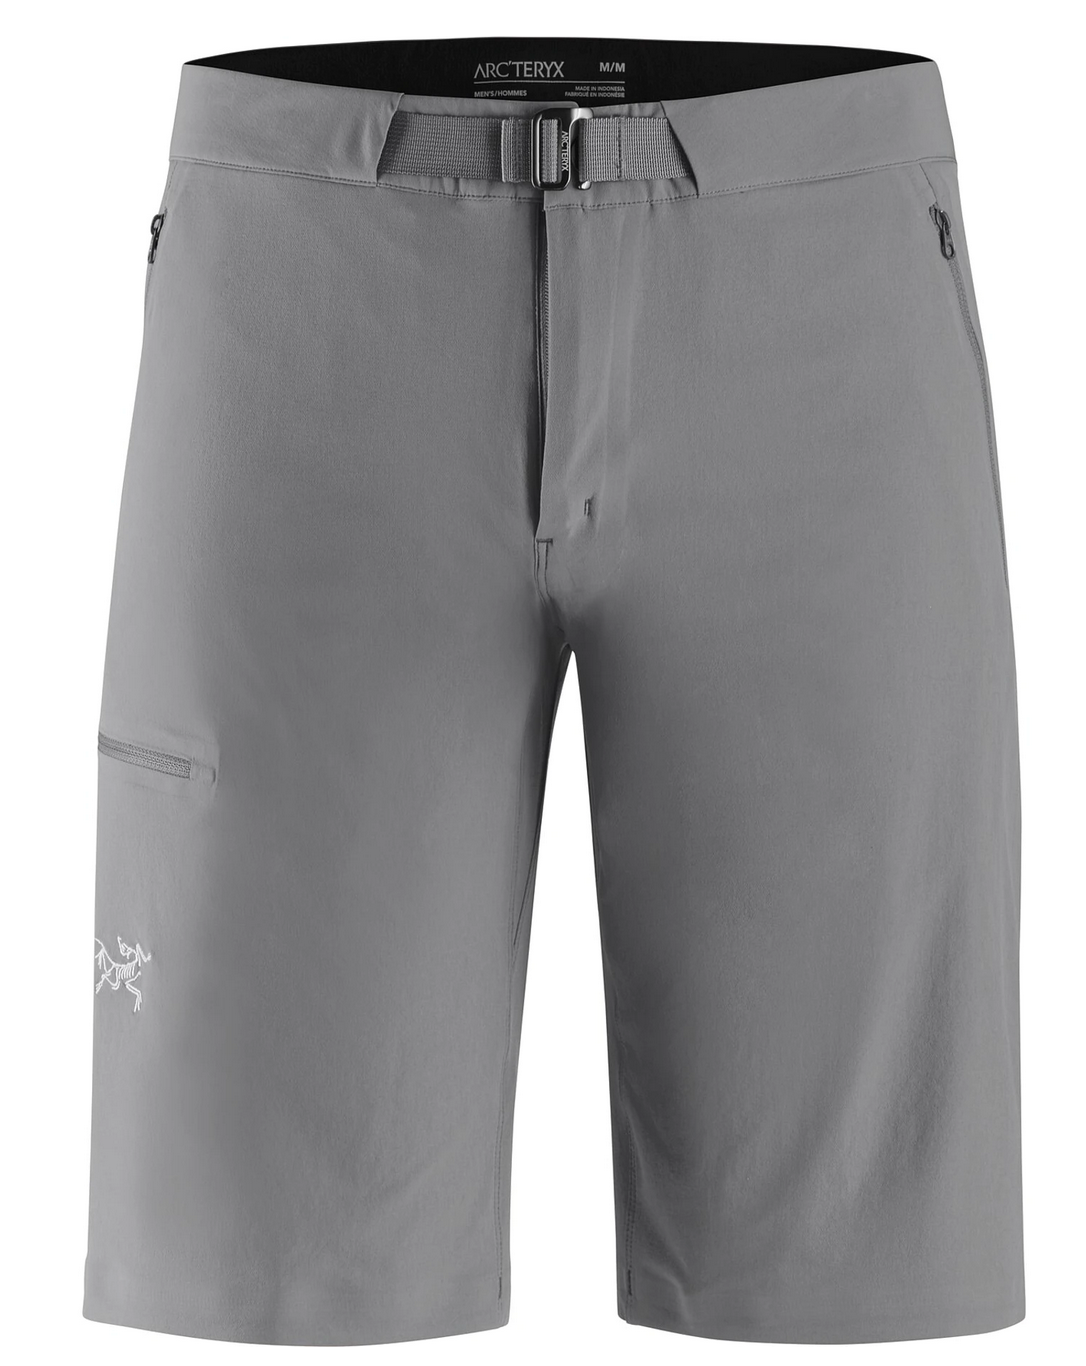 Men's Arc'teryx Gamma LT Short-2